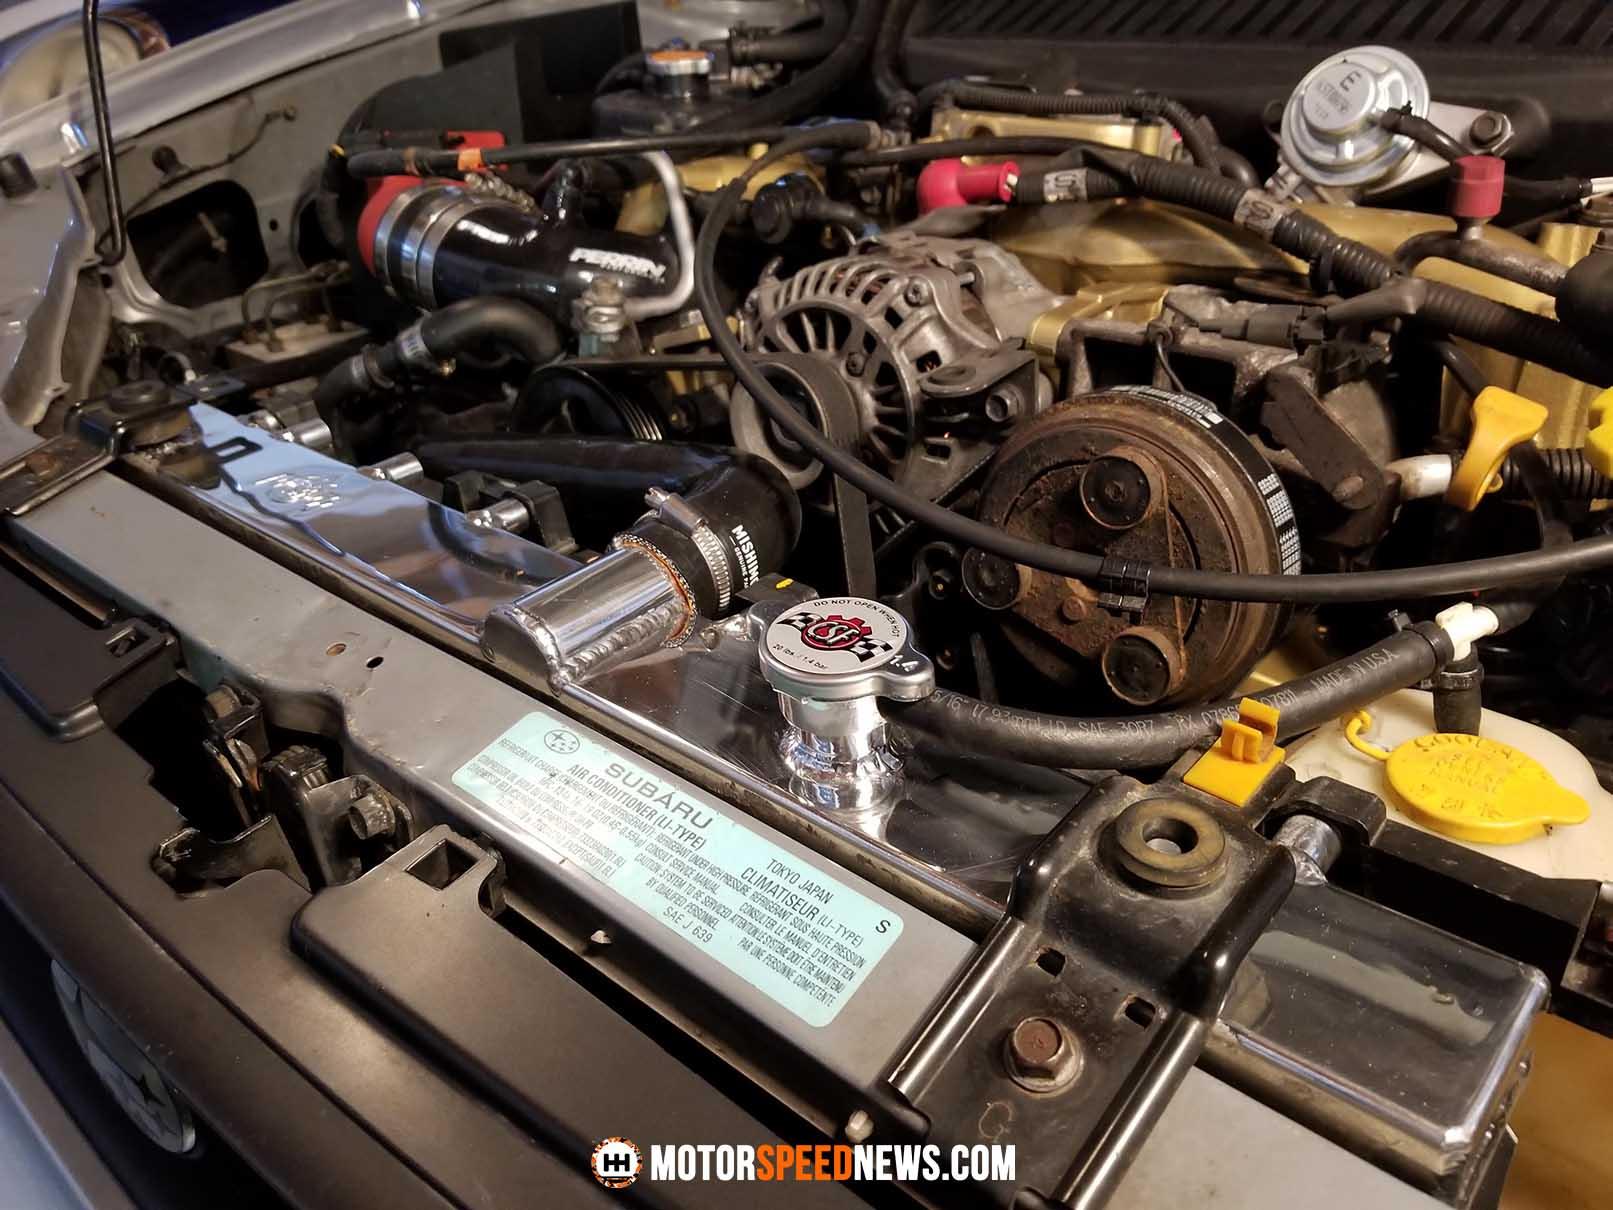 Adding A CSF Radiator To The 02 WRX - Motor Speed News